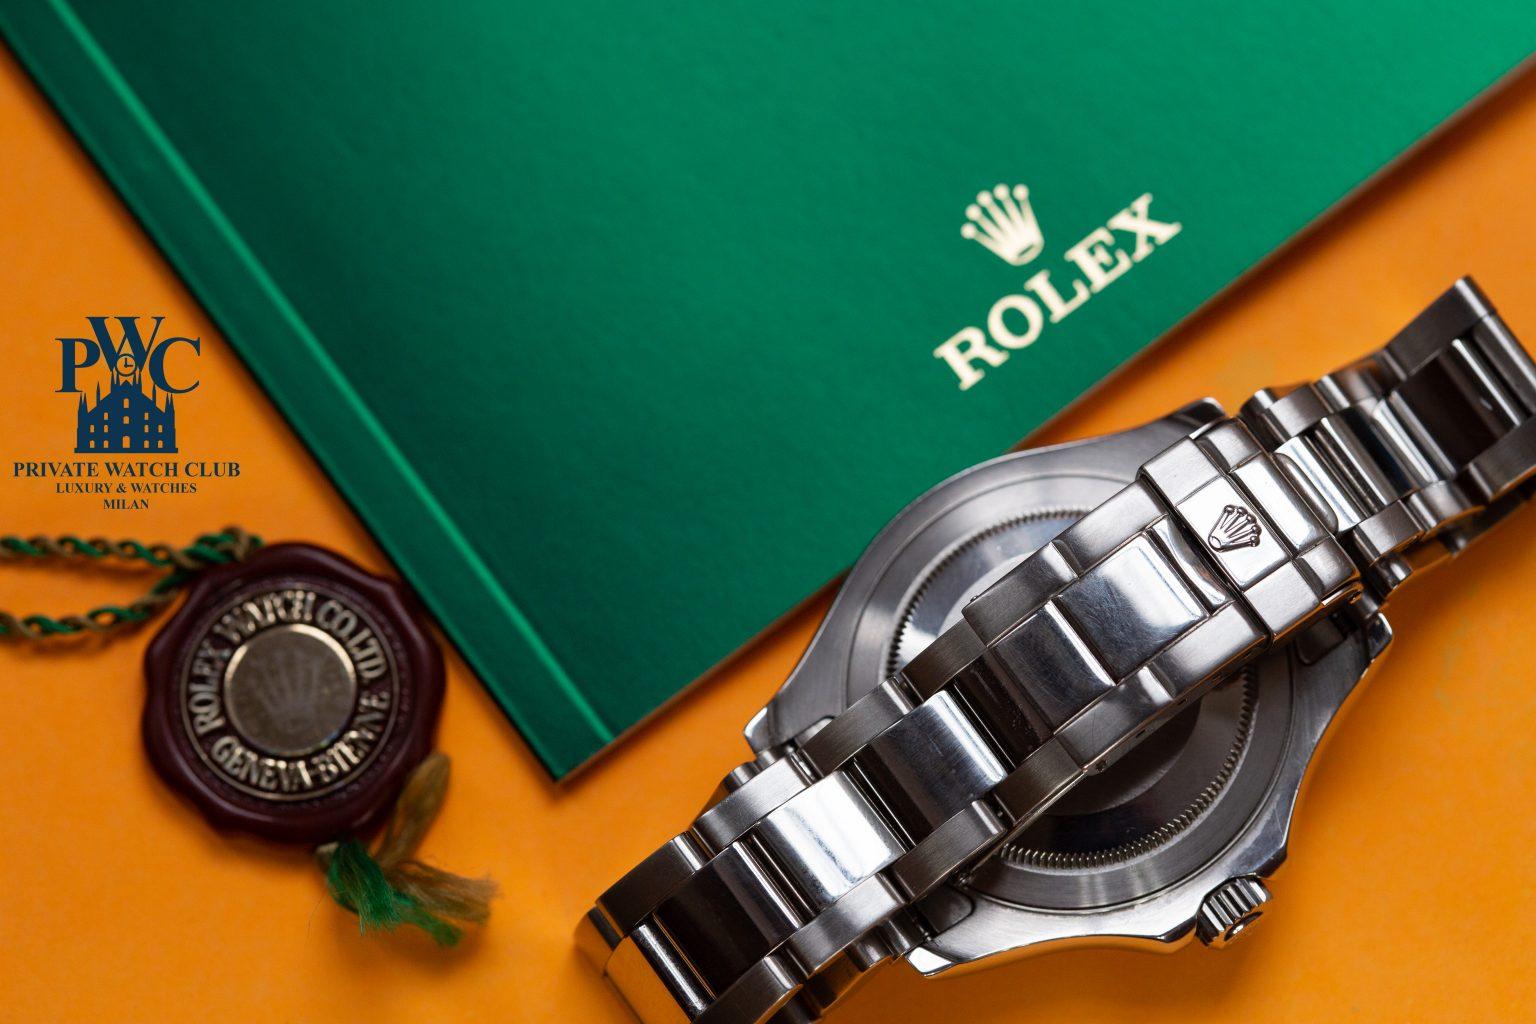 Rolex YACHT-MASTER - REF.16622 RISERVATO - Private Watch Club